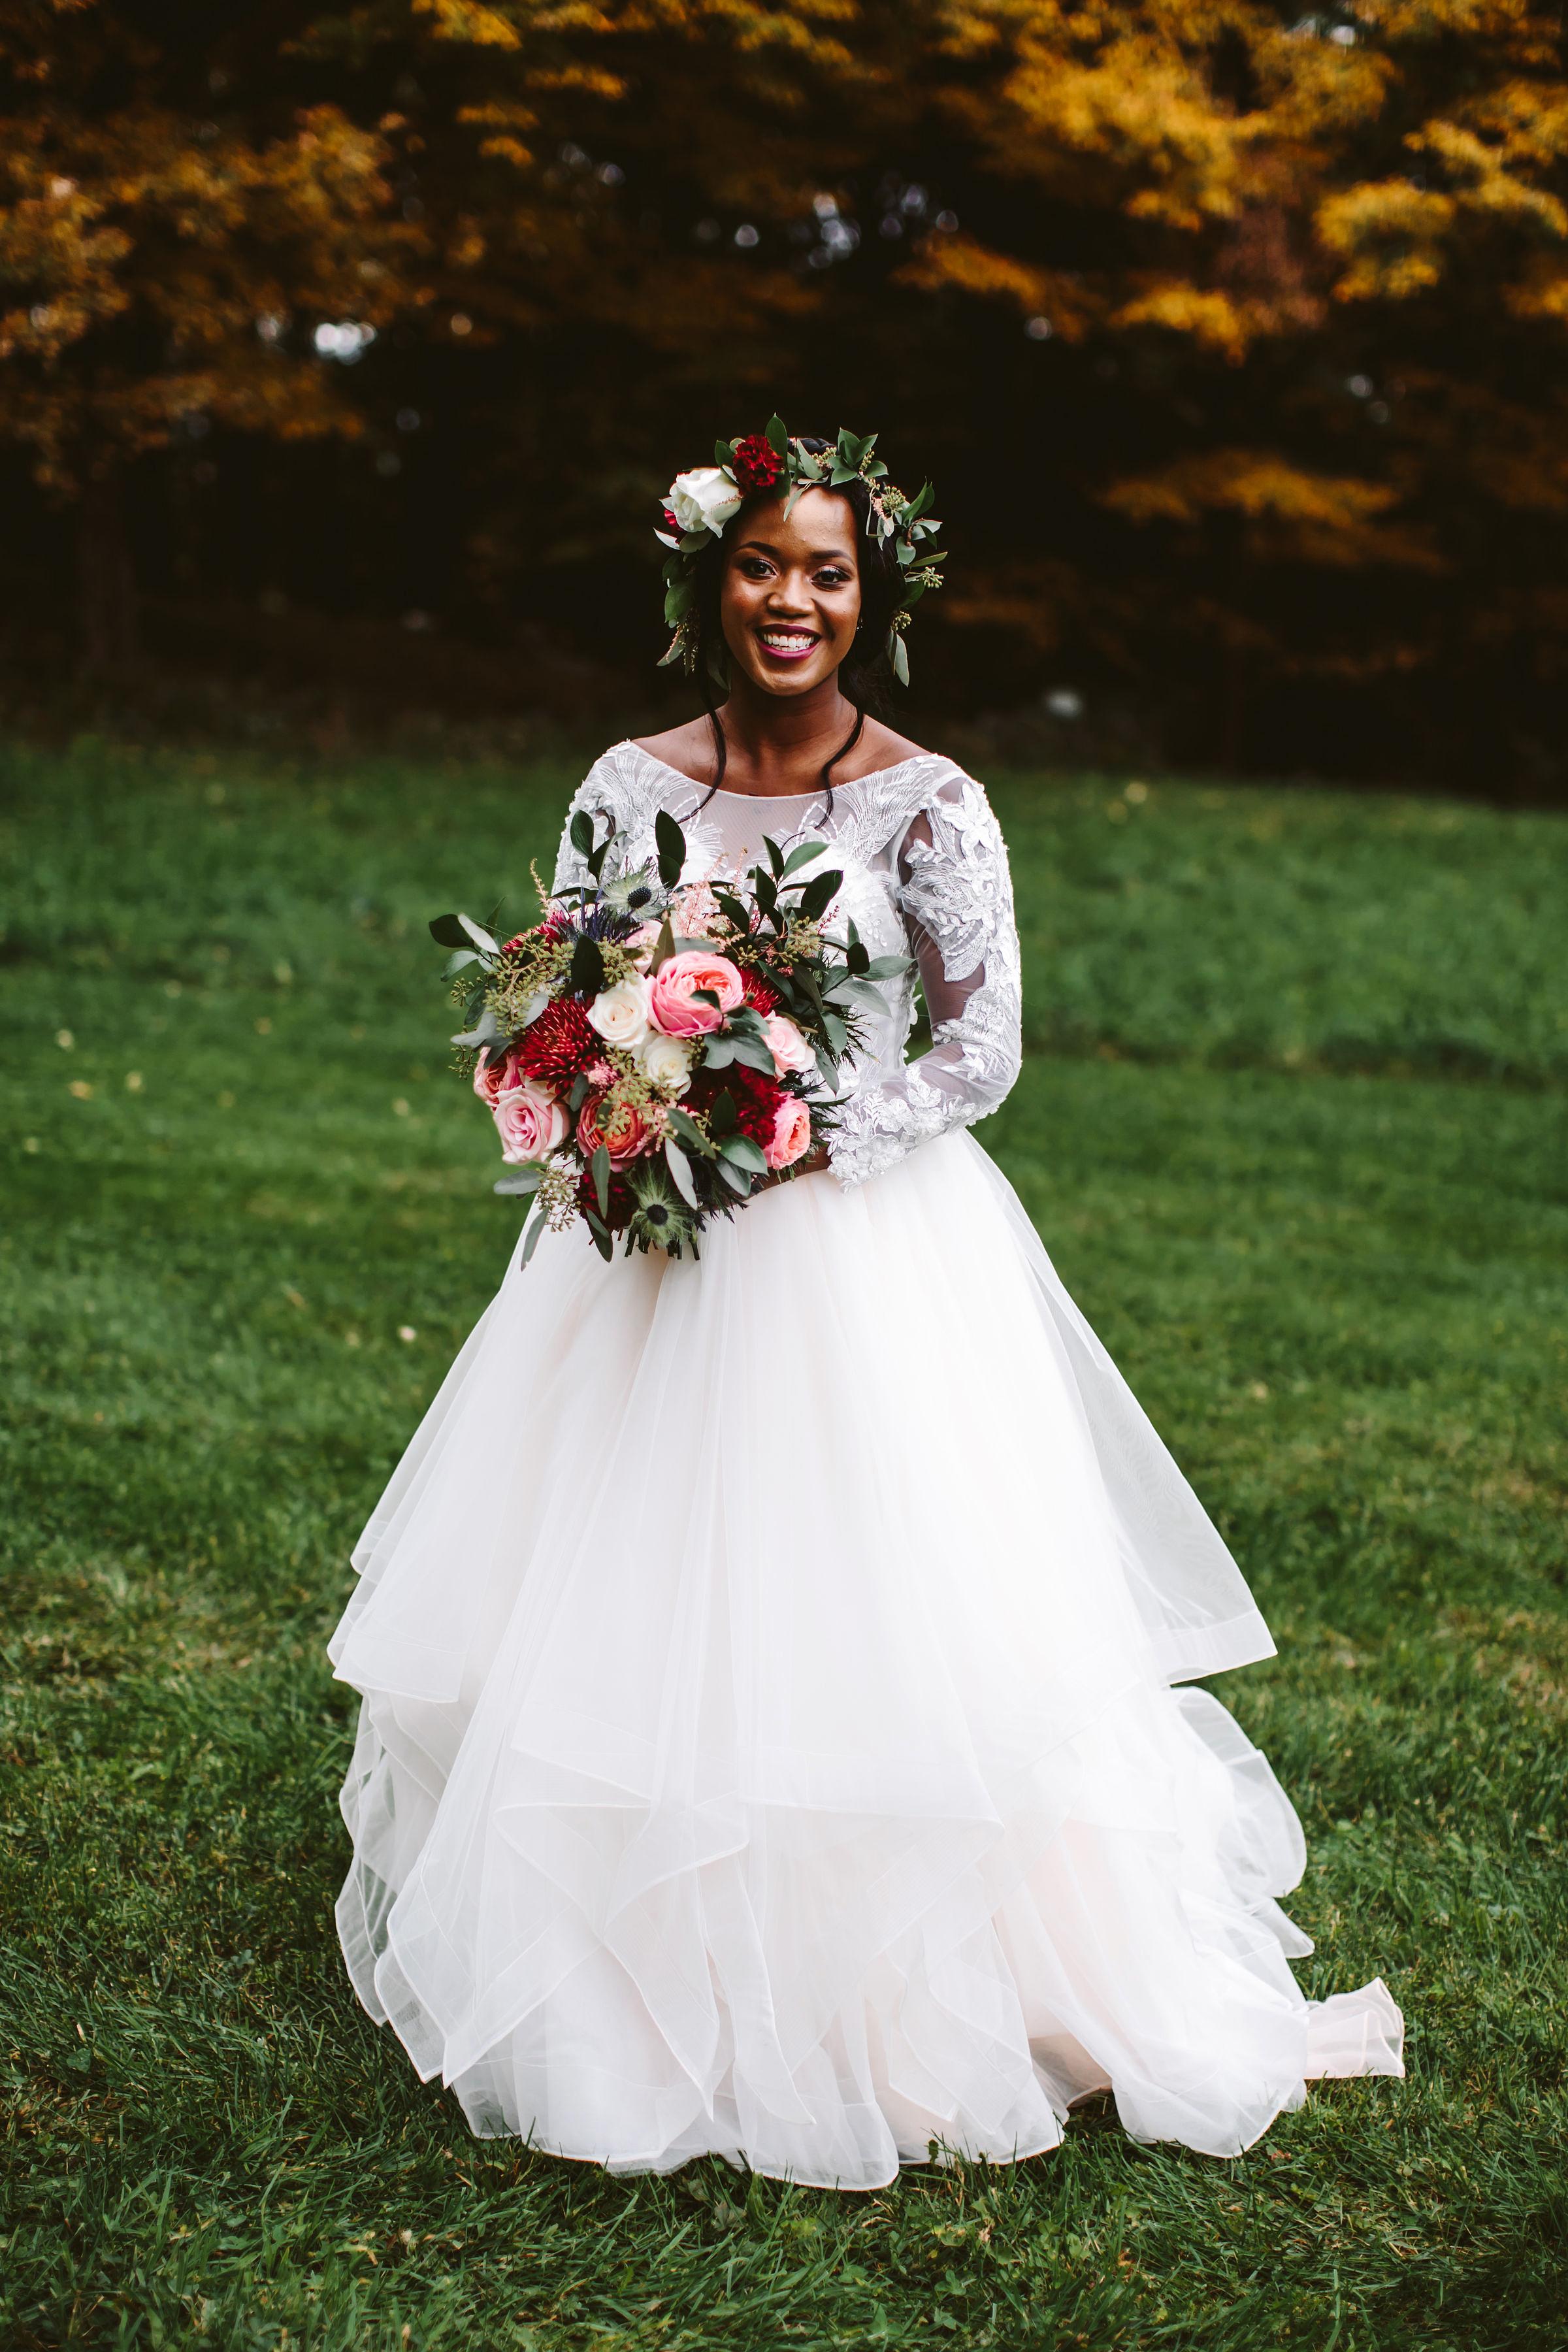 rivka aaron wedding bride dress bouquet flowers